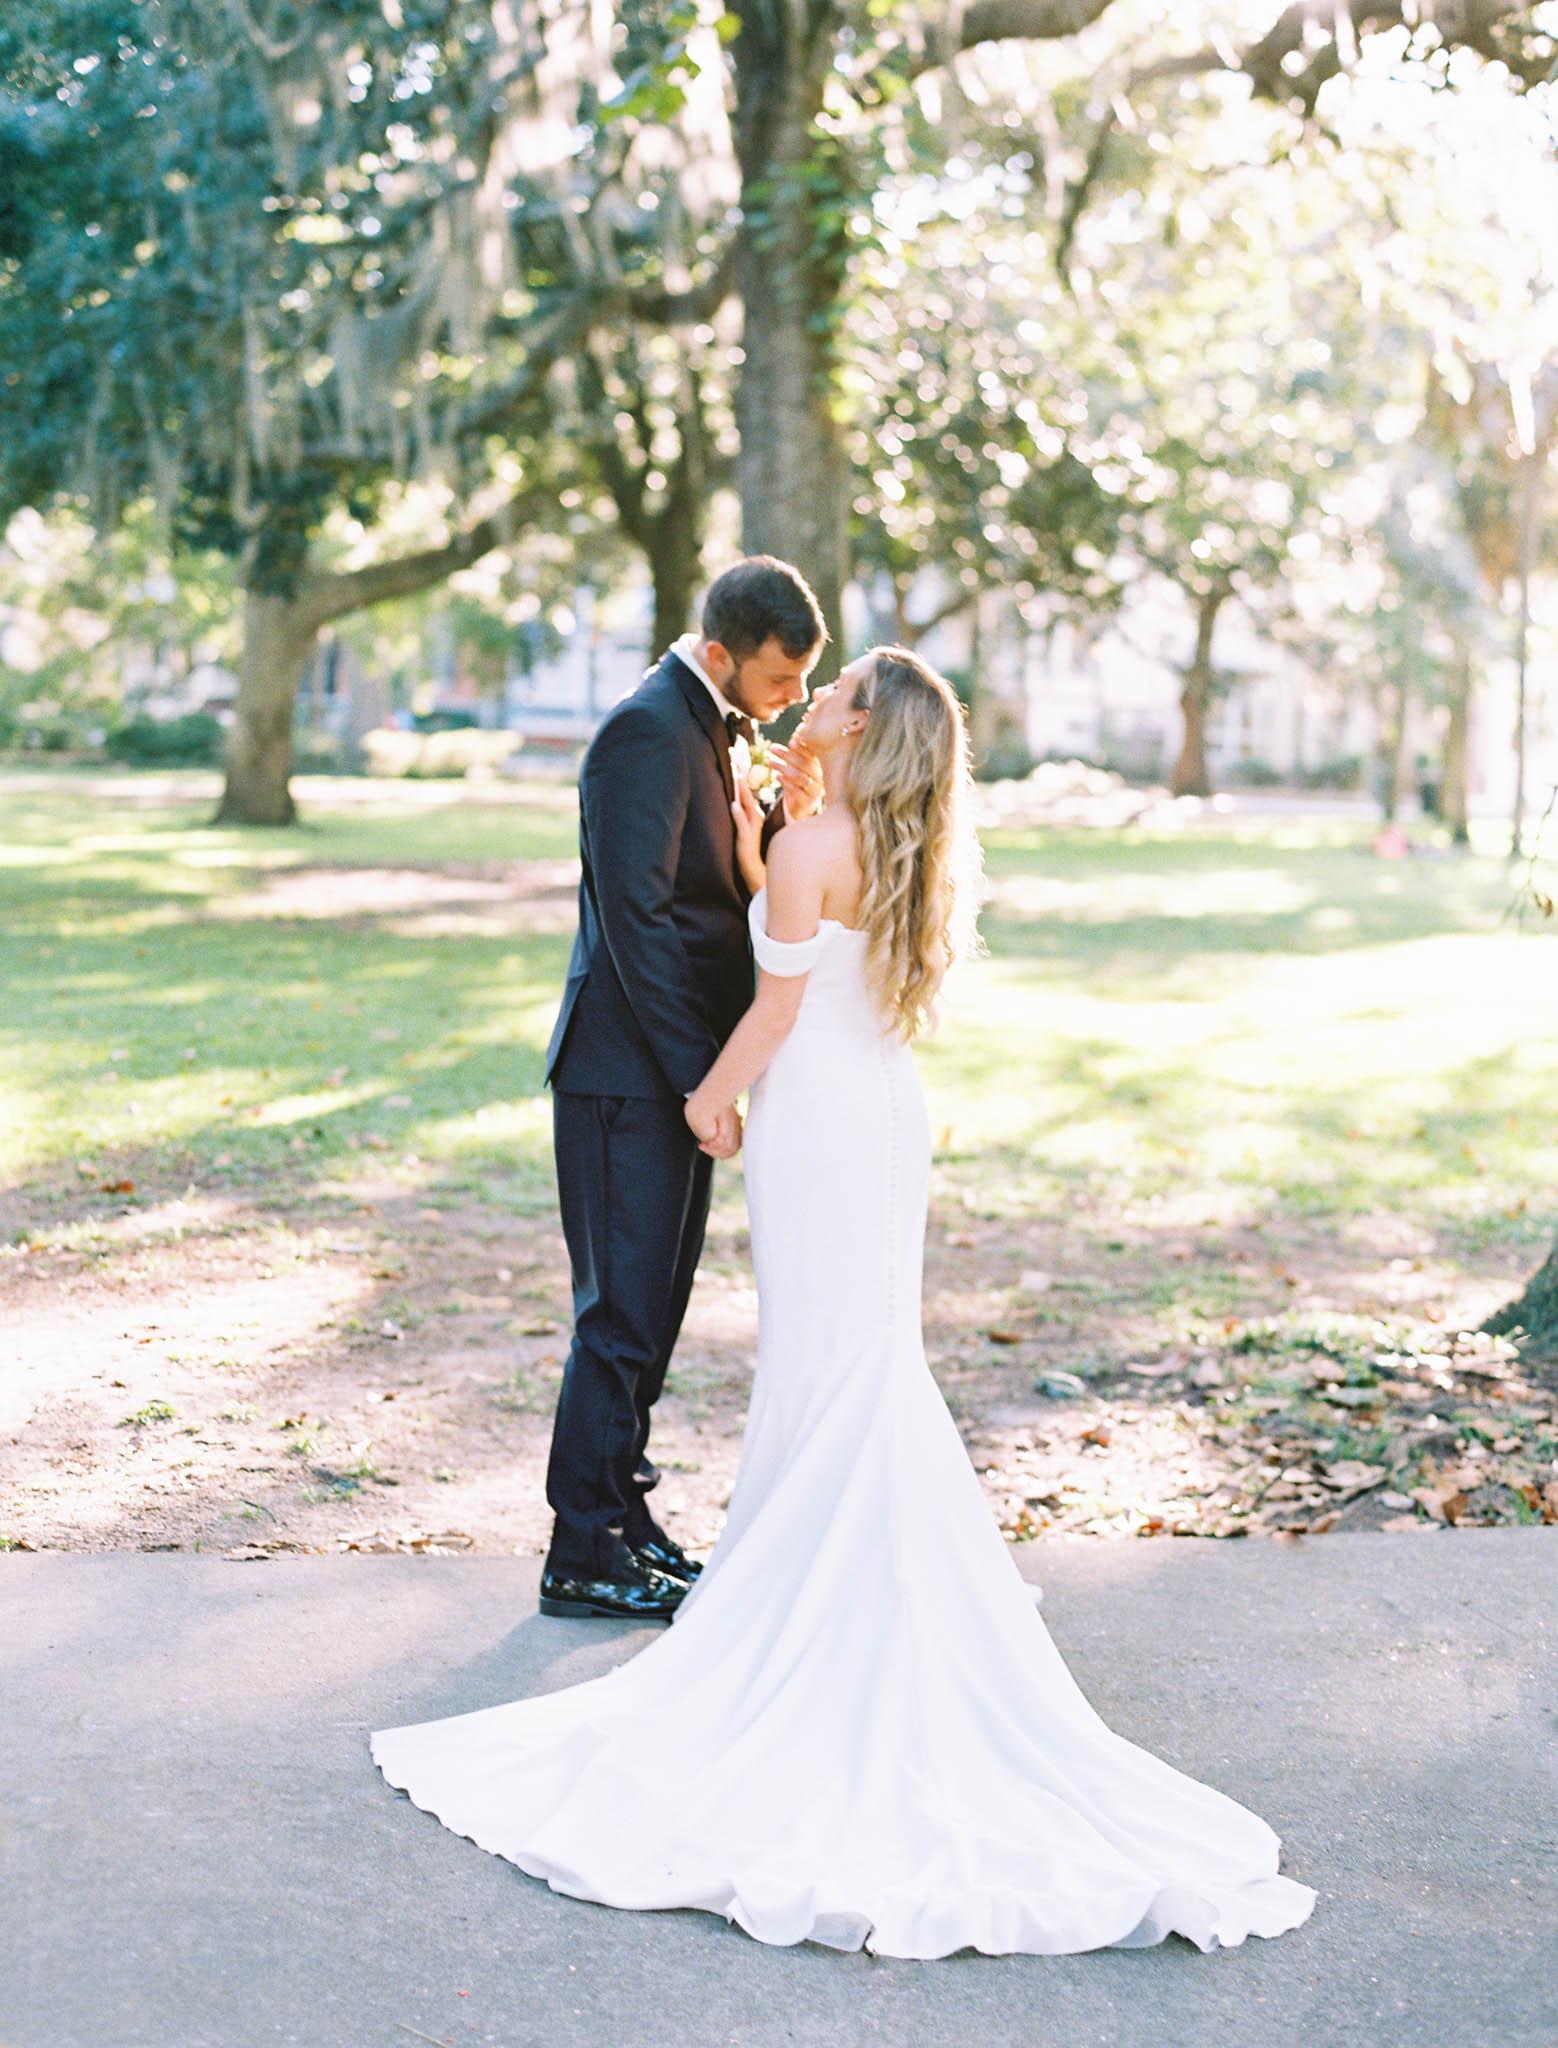 Forsyth Park wedding film photography